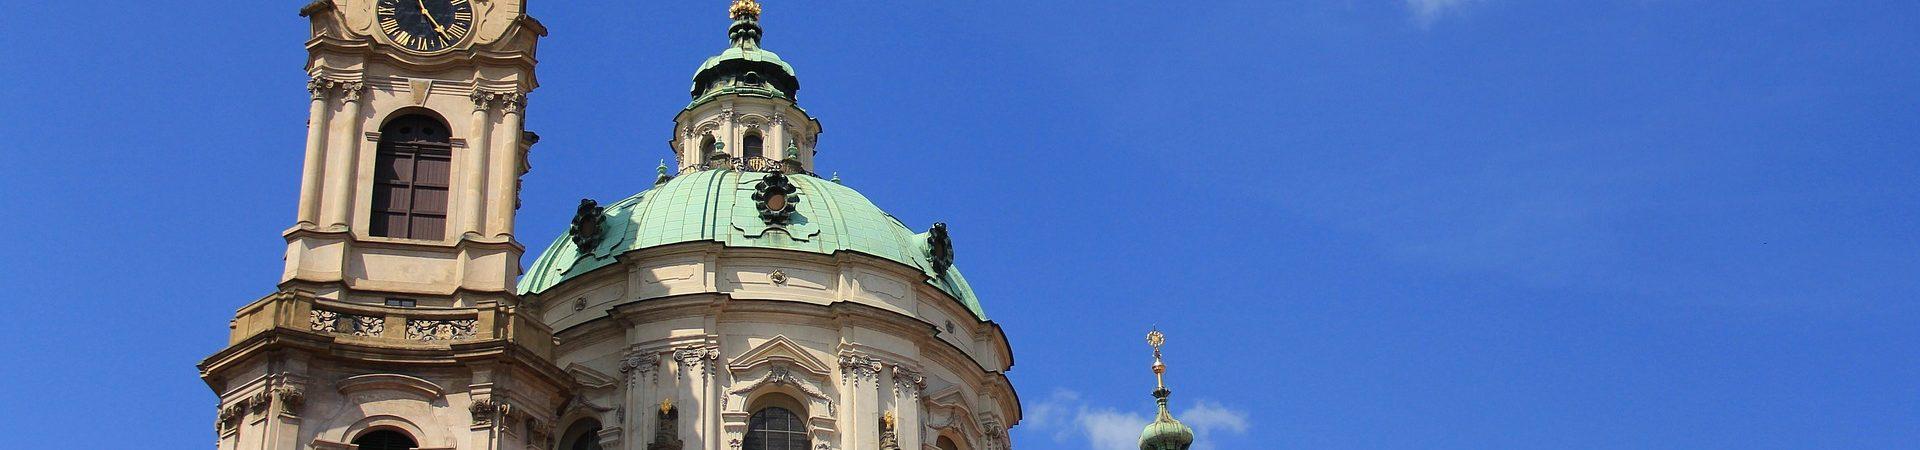 Sankt Nikolaj Kirke i Prag